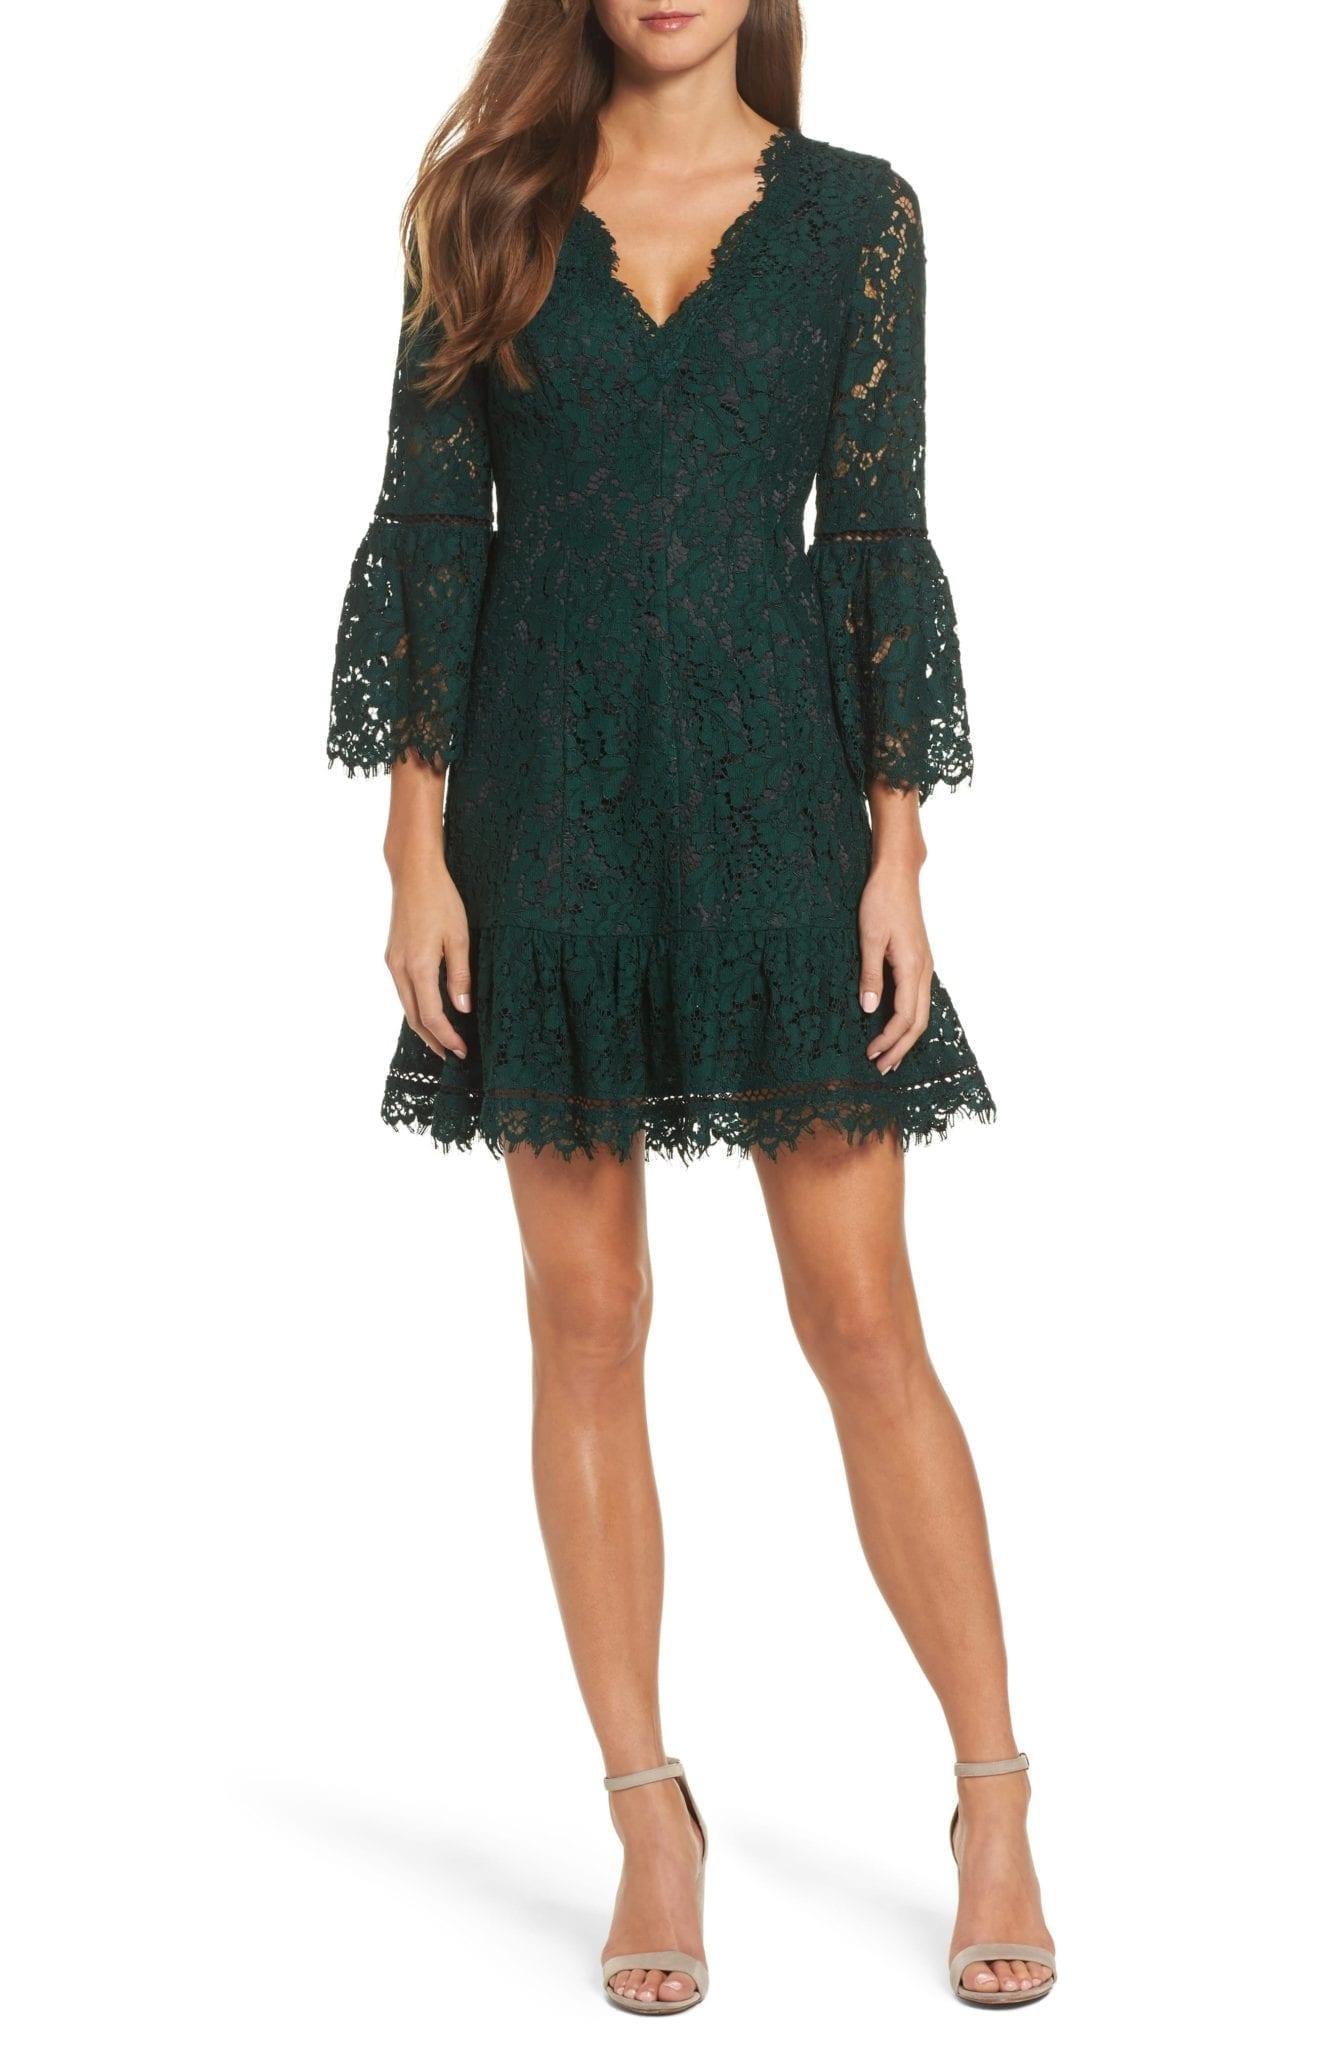 e8eb4f0ce8 ELIZA J Bell Sleeve Scalloped Lace Green   Black Dress - We Select ...